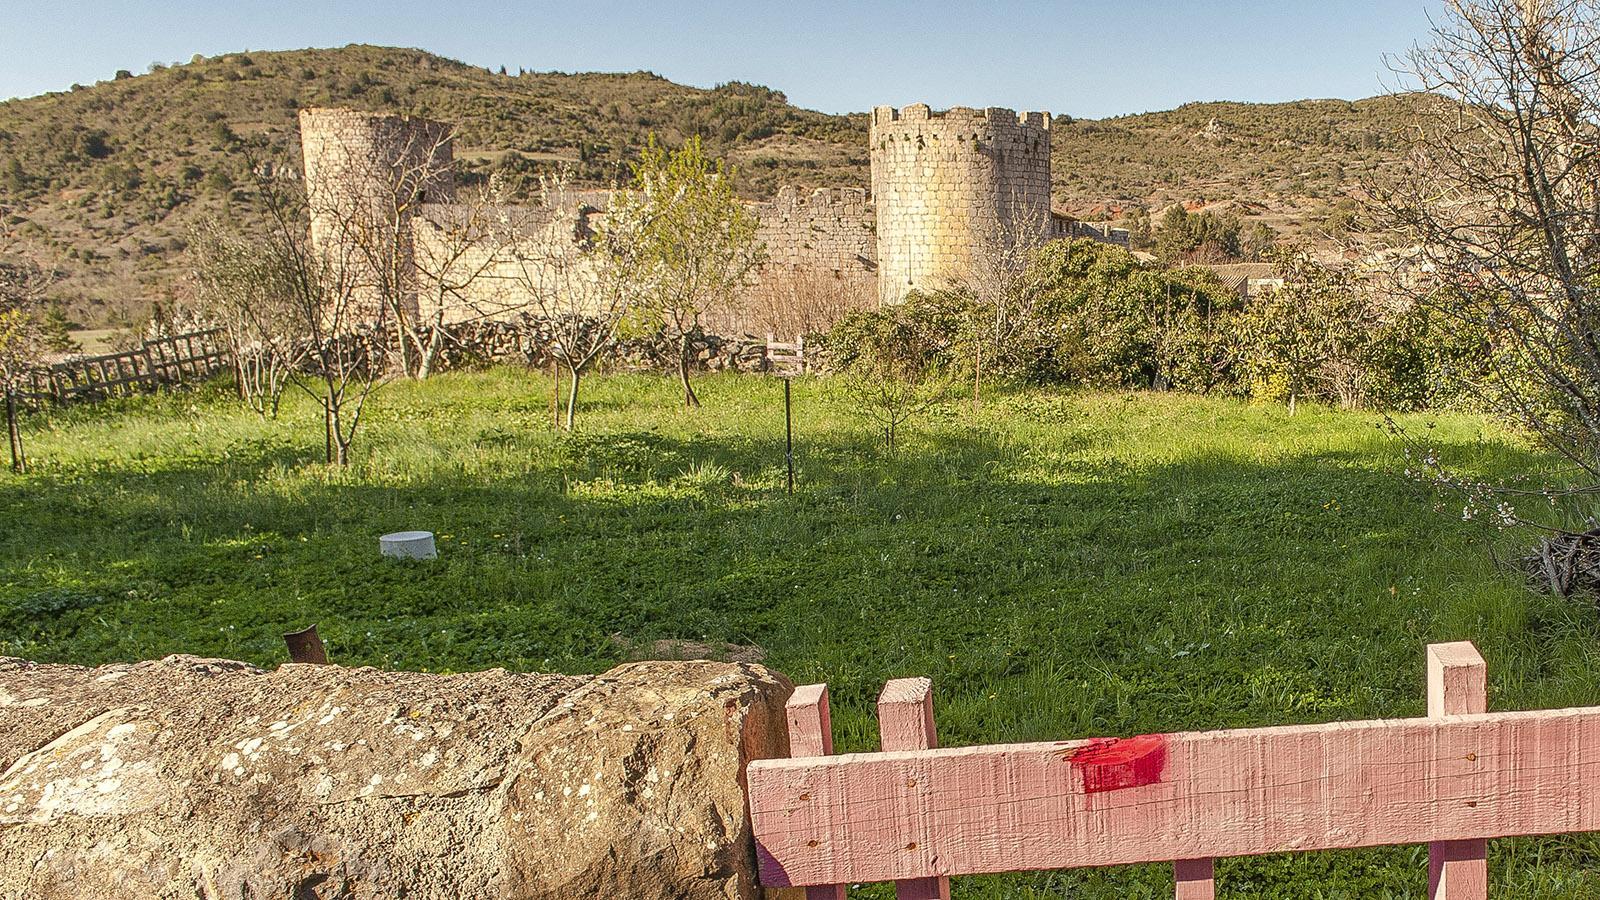 Sentier Cathare: die Katharerburg von Villerouge-Termenès. Foto: Hilke Maunder